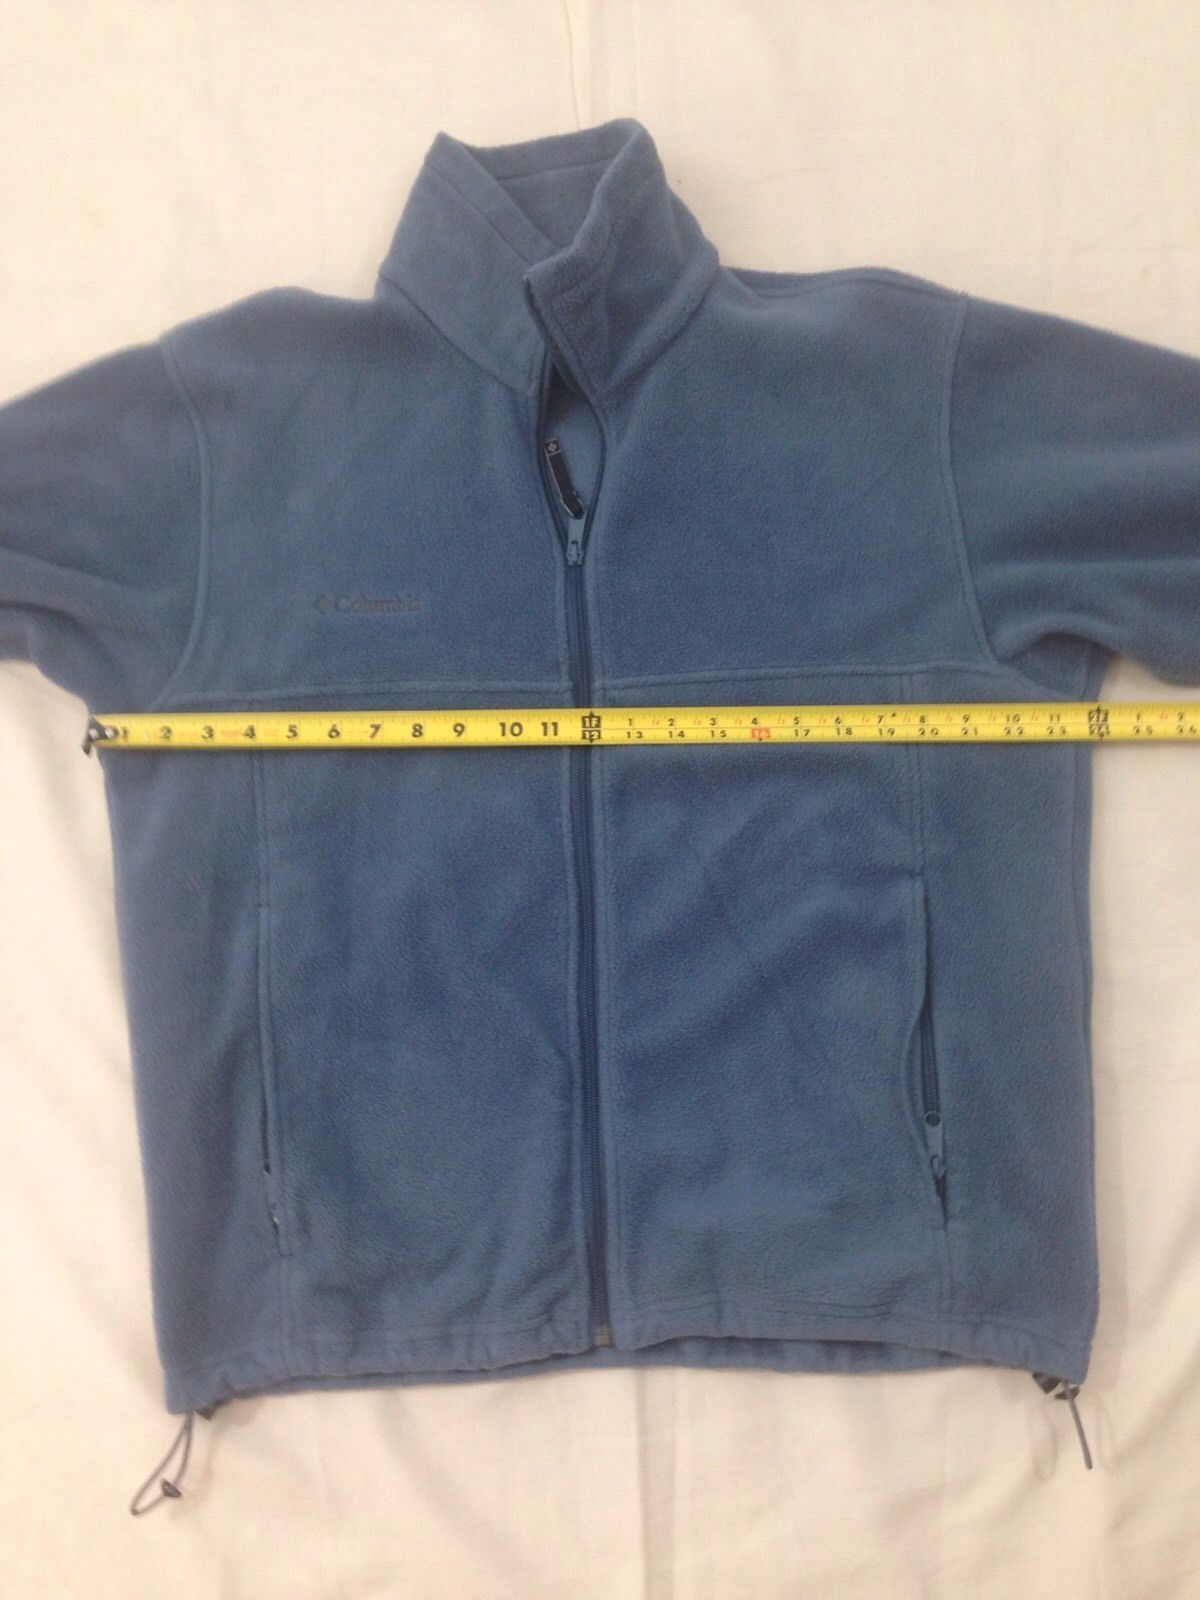 Columbia Mens M Dusty Blue Hiking Camp Lightweight Zip Front Fleece Jacket image 5